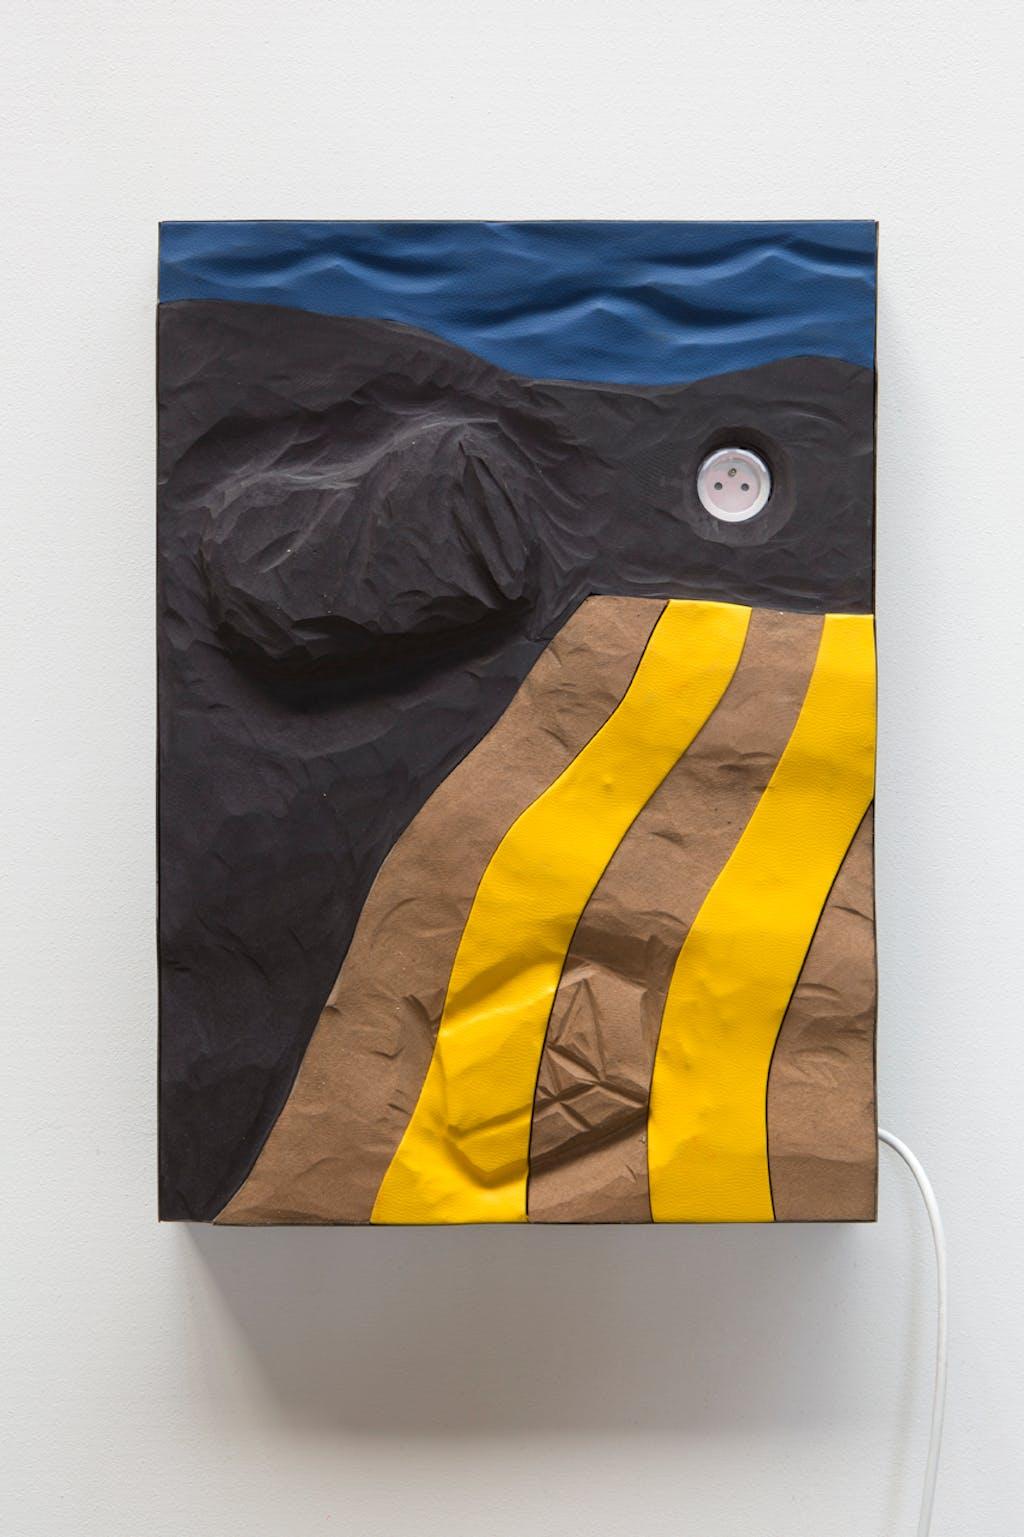 Towel on Black Sand - © kamel mennour